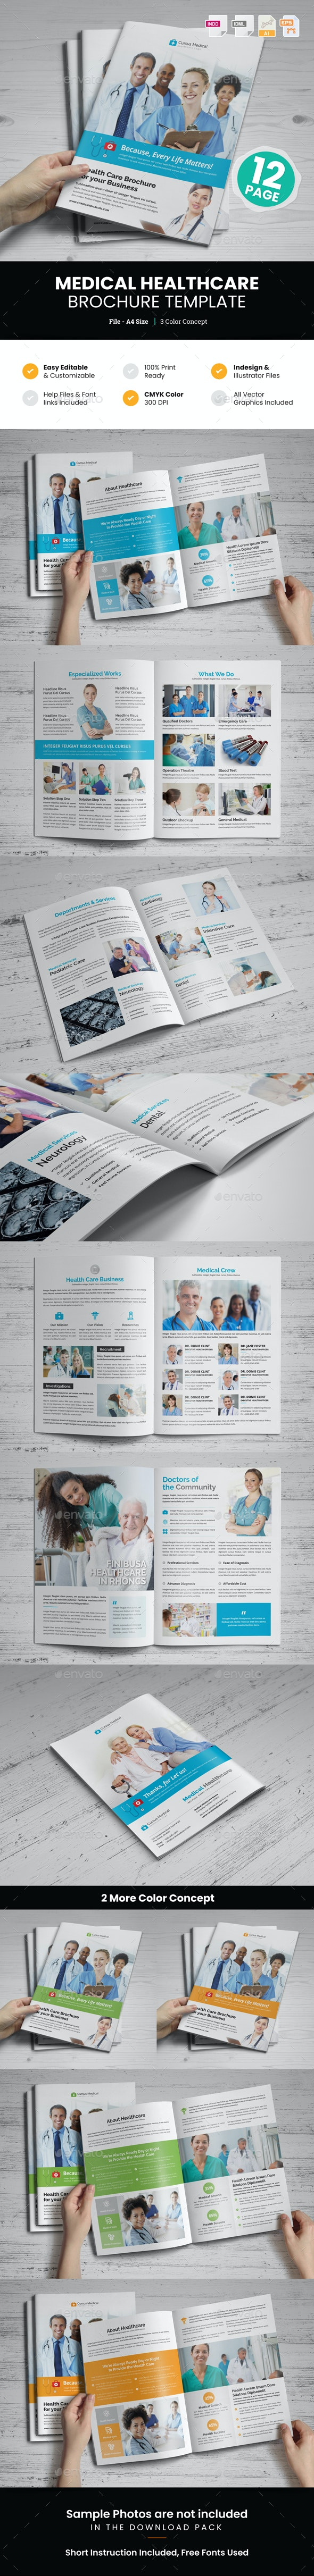 Medical HealthCare Brochure v2 - Corporate Brochures